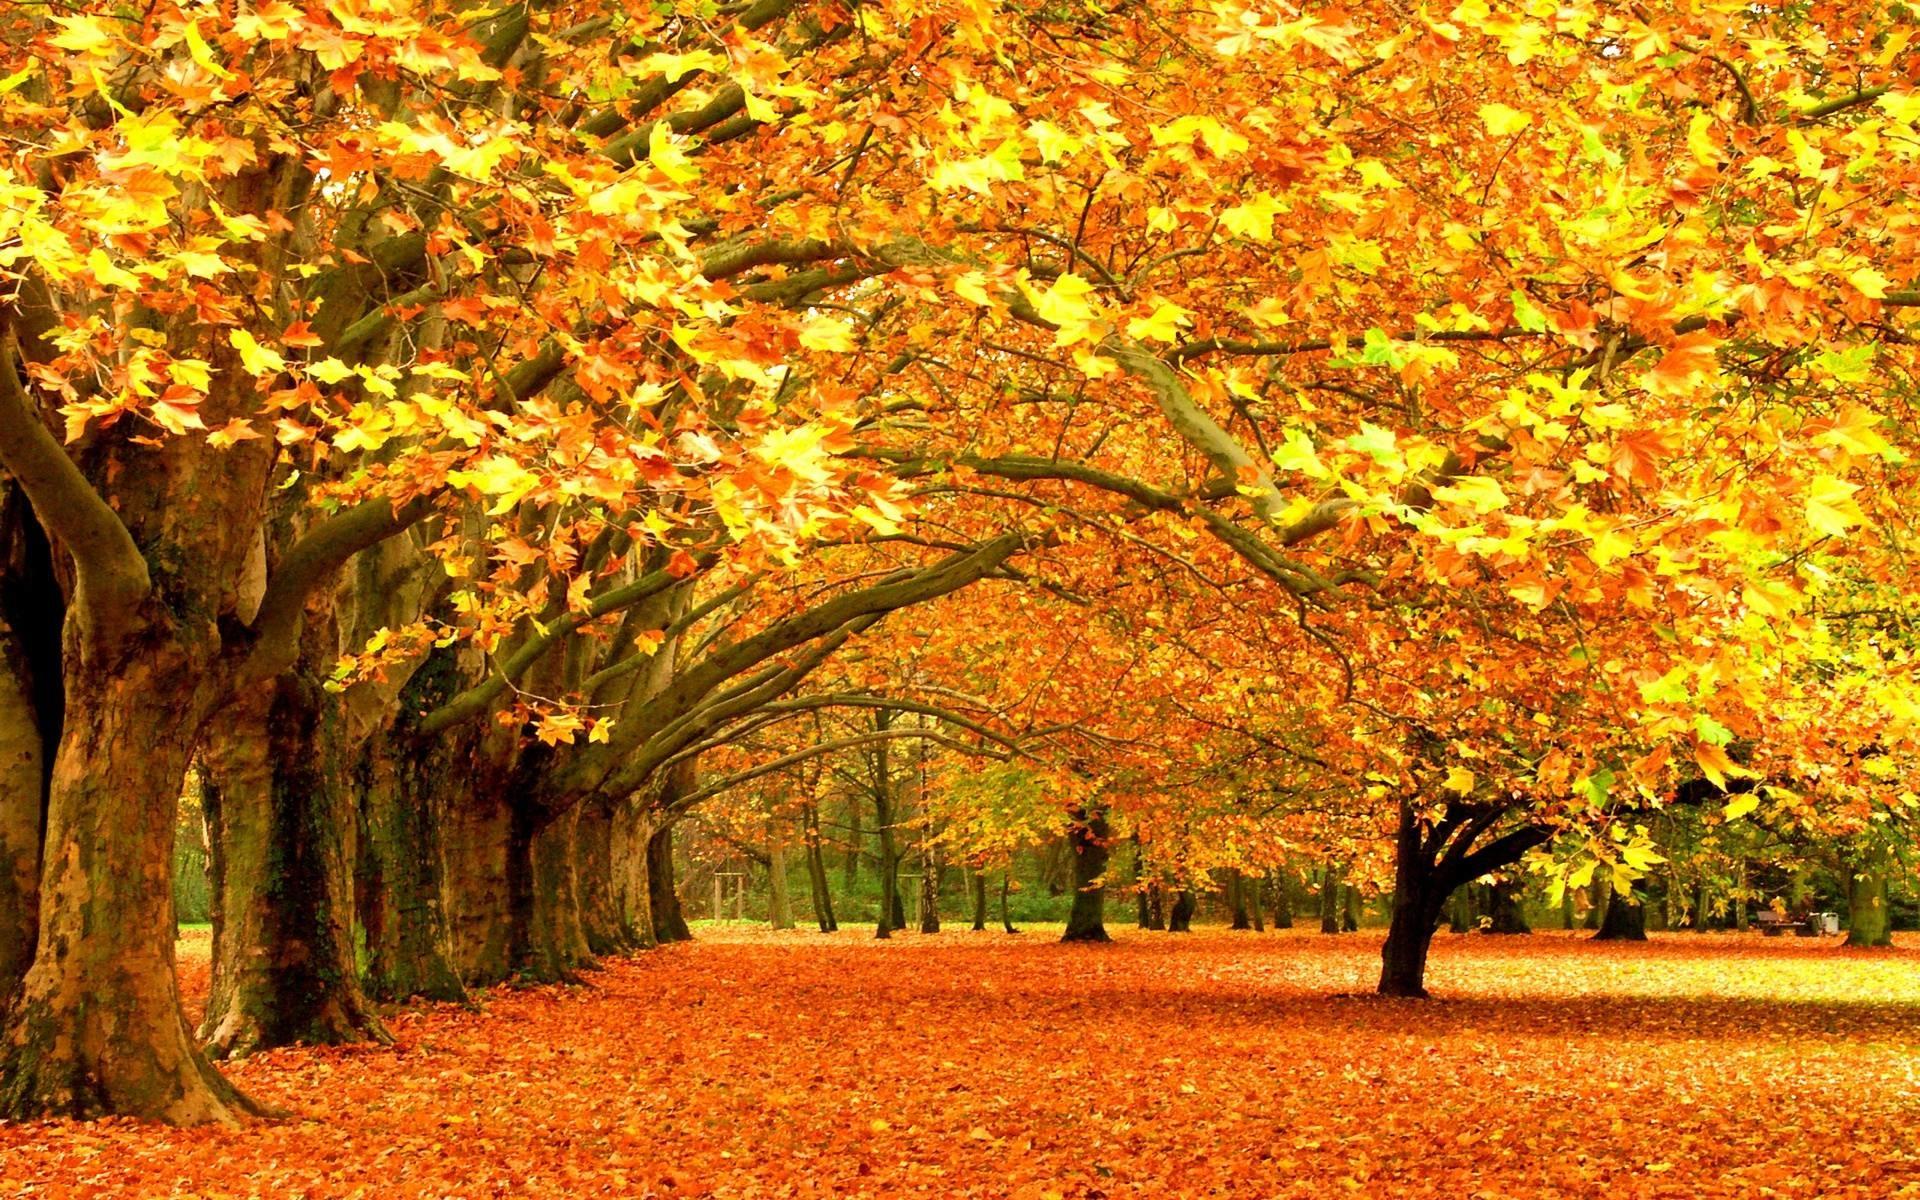 Fall Leaves Wallpaper 11 Free Desktop HD Wallpaper for .